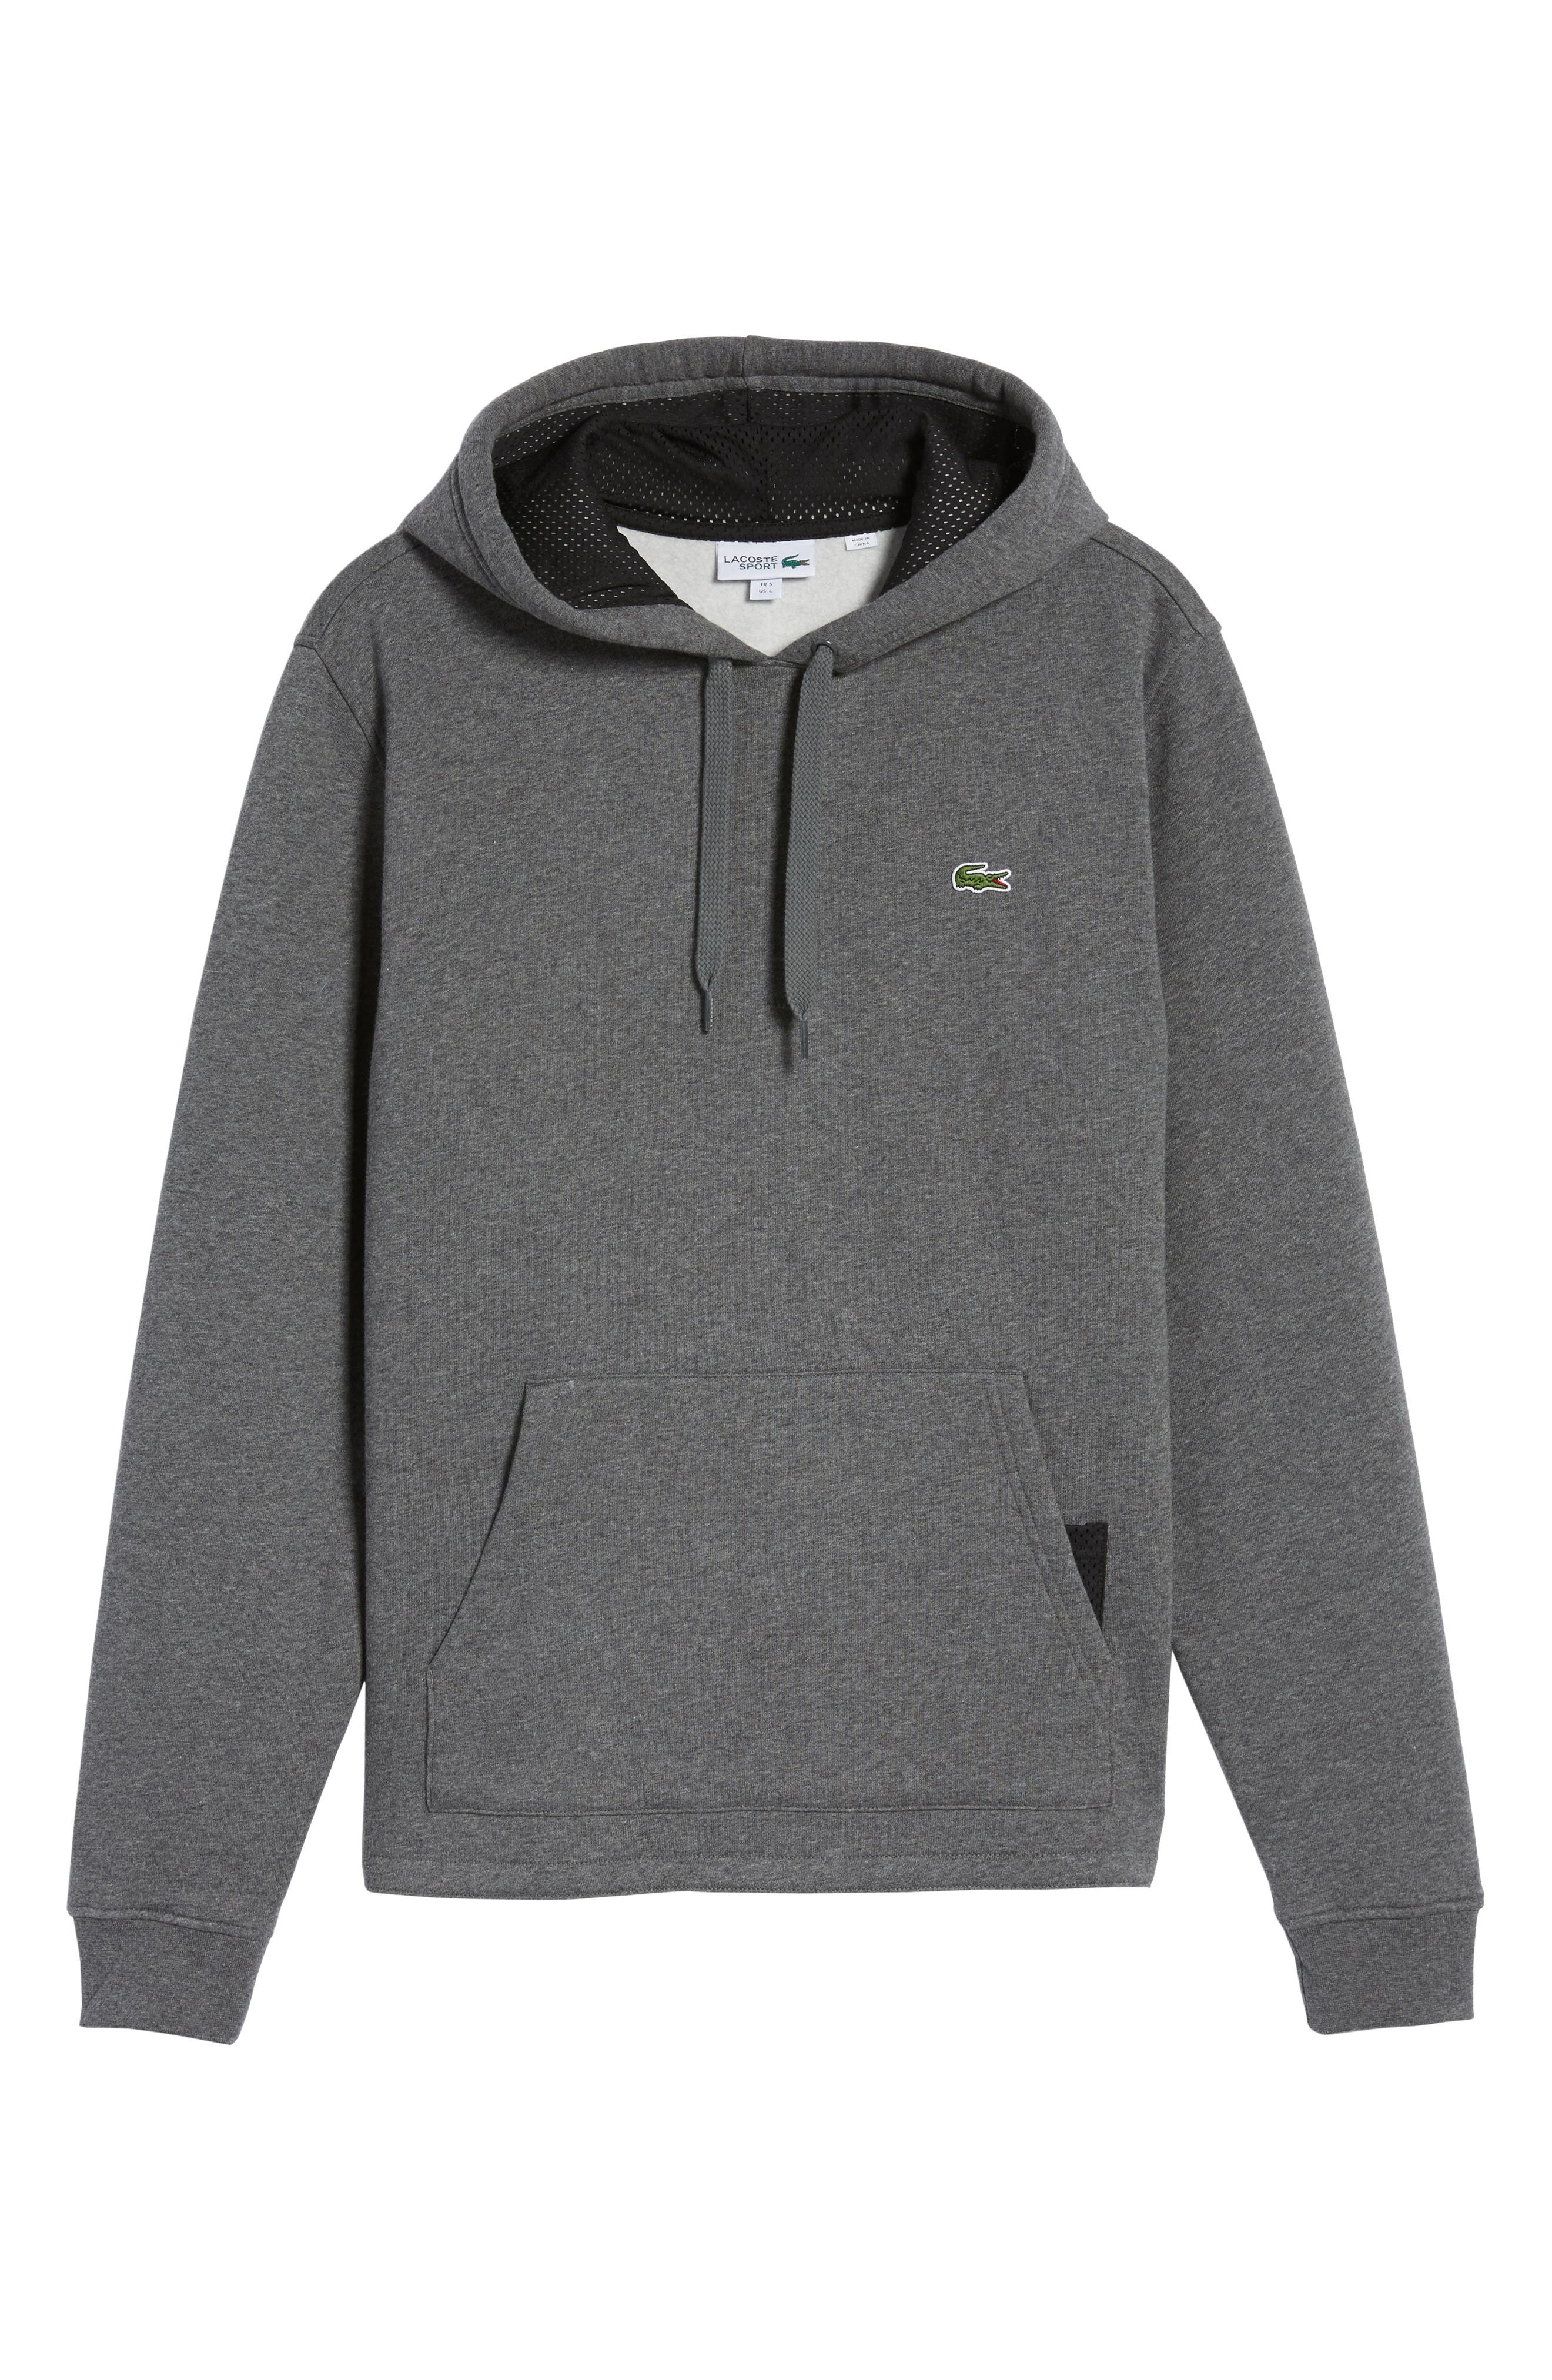 Main Image - Lacoste Brushed Fleece Logo Hoodie